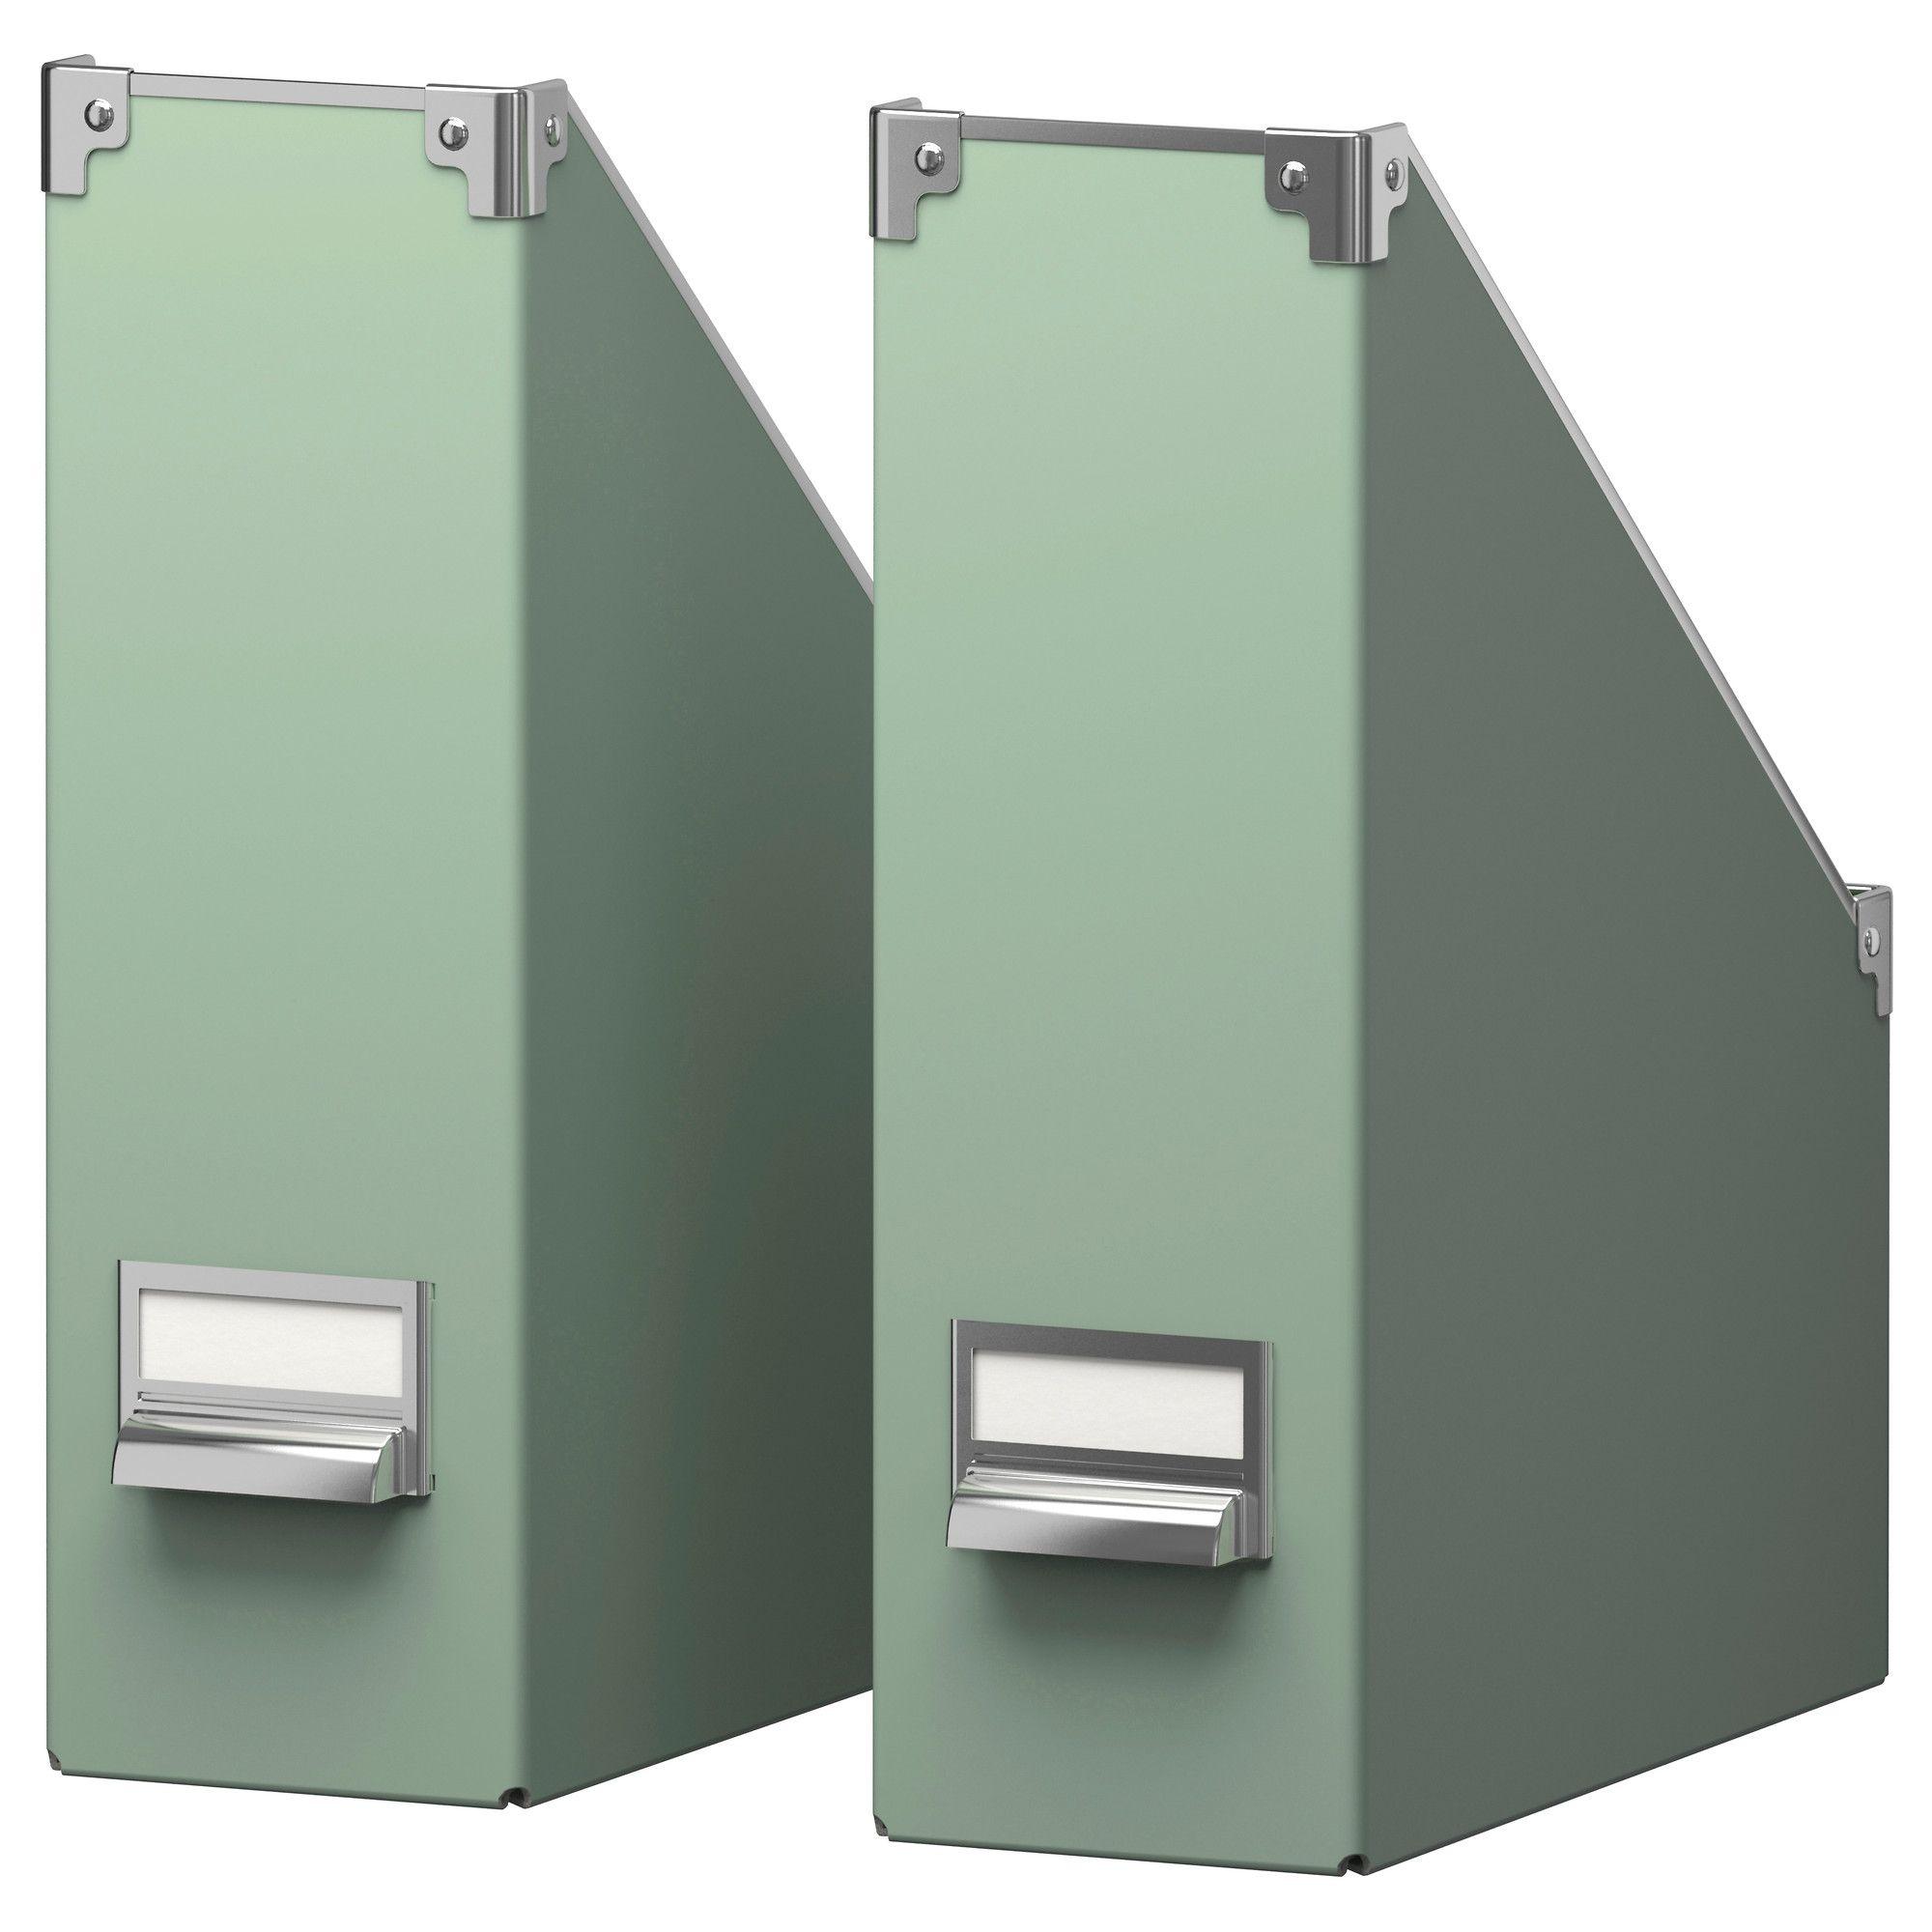 kassett archivador verde ikea zona de trabajo pinterest. Black Bedroom Furniture Sets. Home Design Ideas